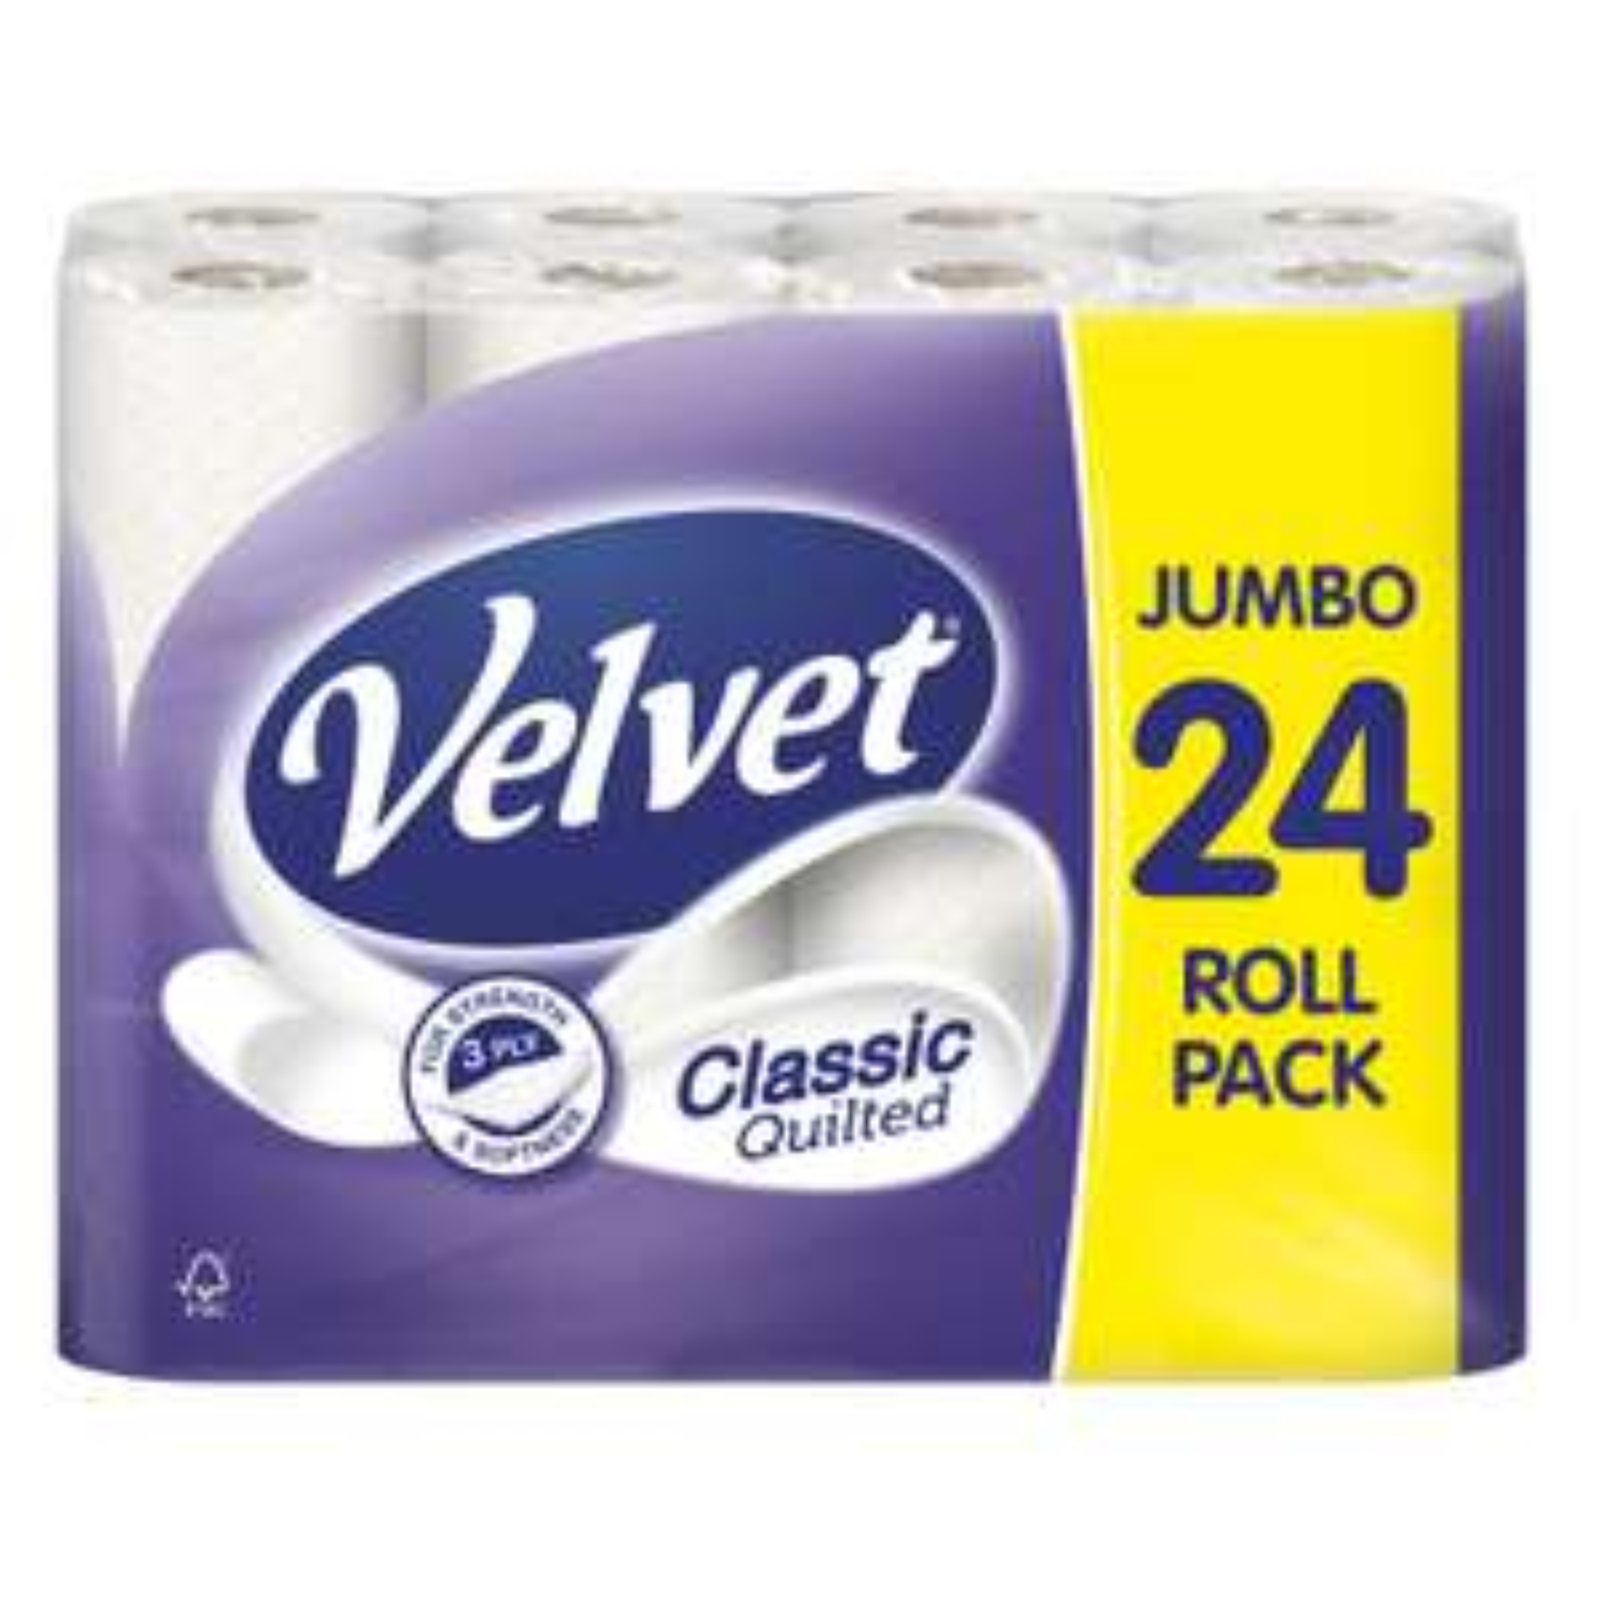 Velvet classic quilted 3 ply Jumbo 24 roll pack £7 at Wilko (Totenham Hale Retail Park)